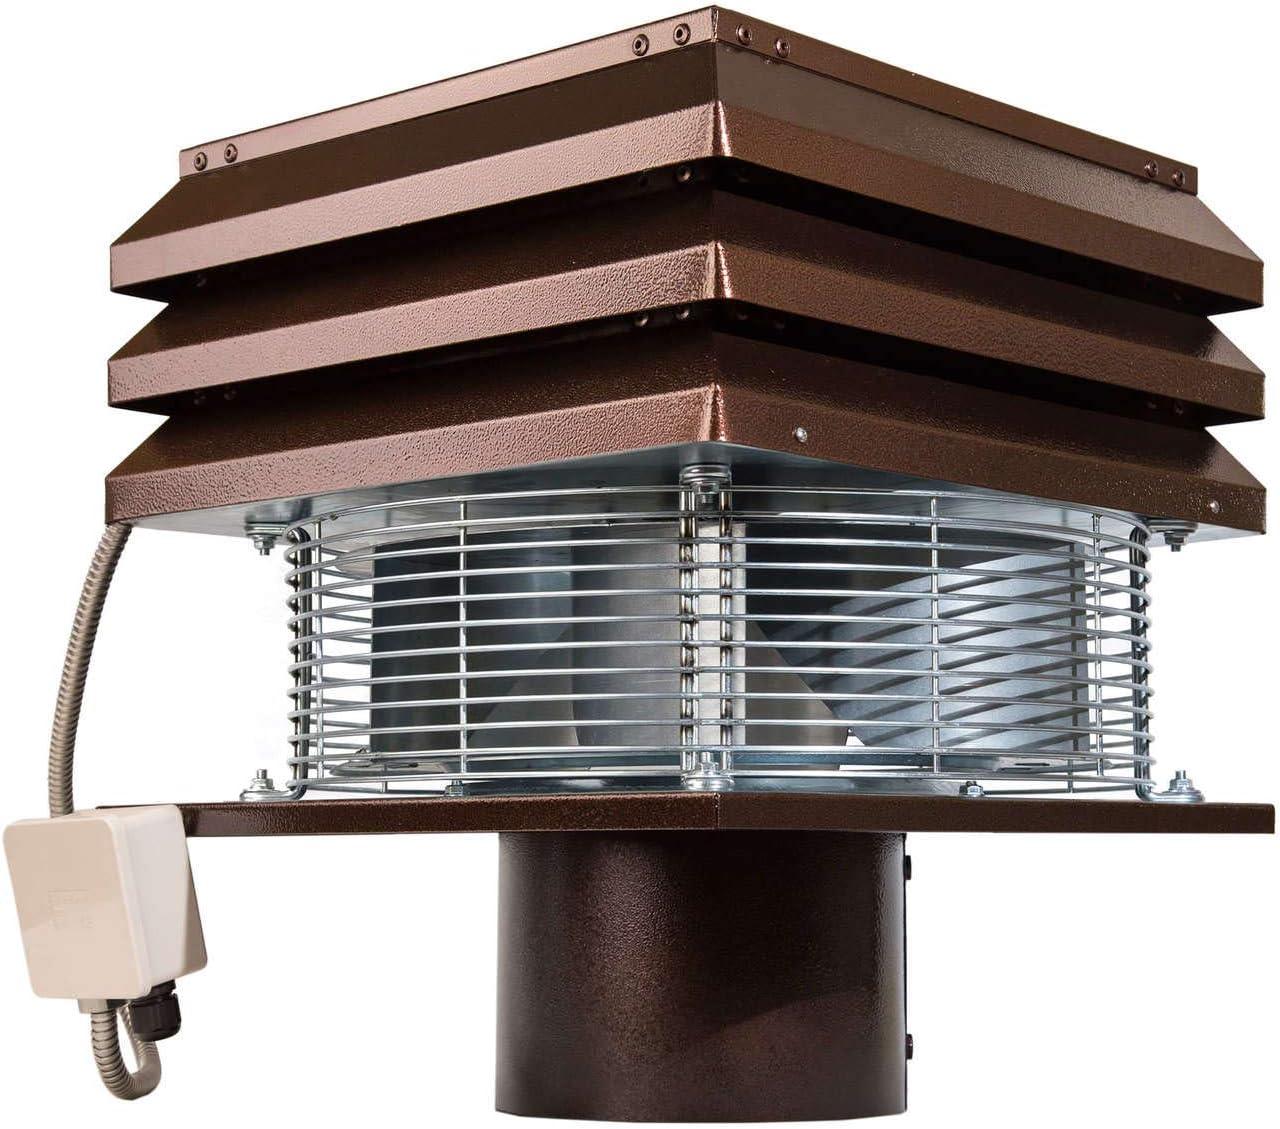 Extractor de humo Extractores de humo para chimeneas para barbacoa Aspirador de humos para chimenea extractor de chimenea extractor chimenea leña Gemi Elettronica modelo profesional redondo de 20 cm